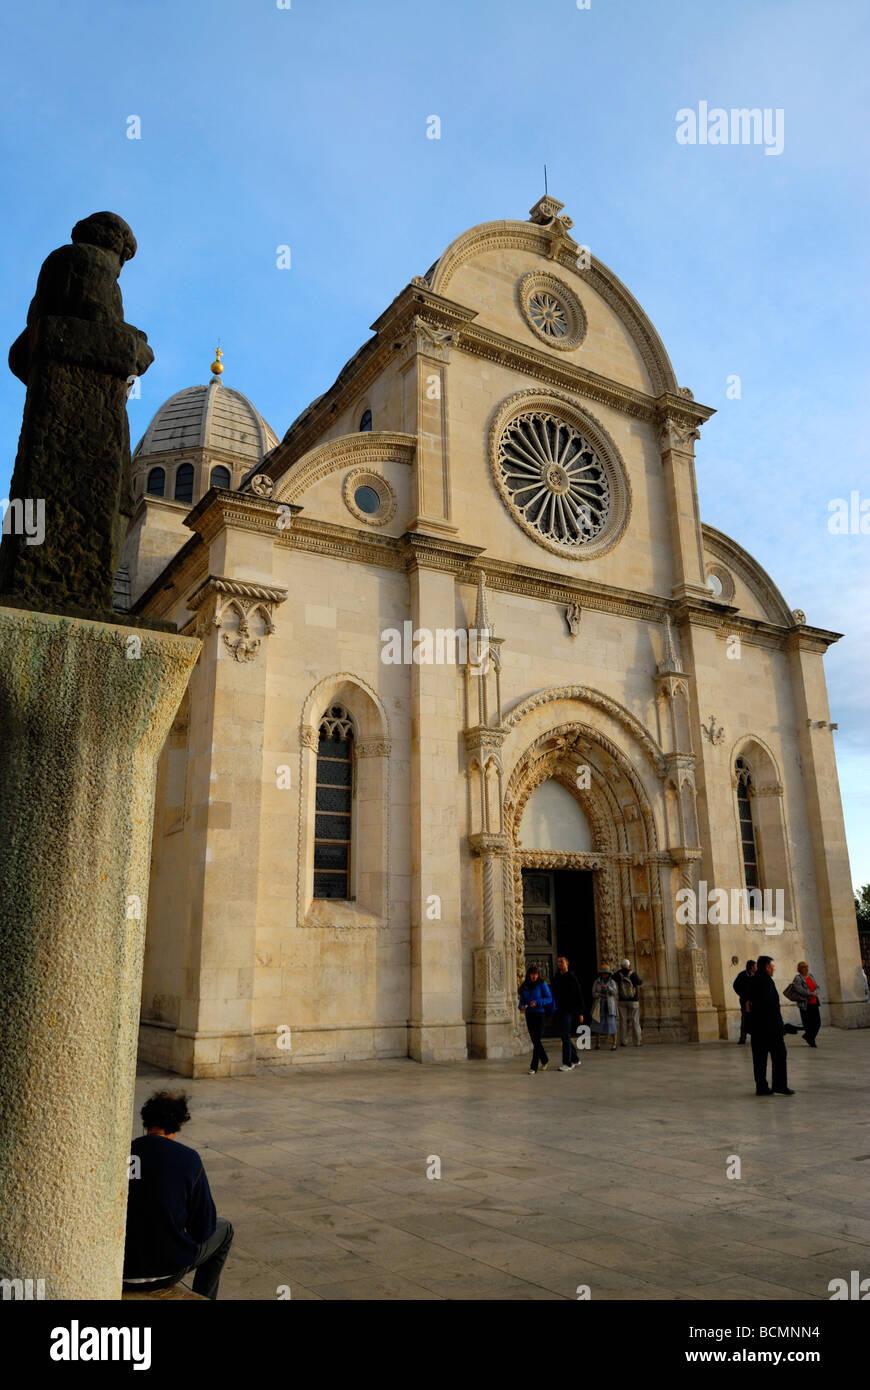 Cathedral of St James at Sibenik on Dalmatian Coast of Croatia - Stock Image